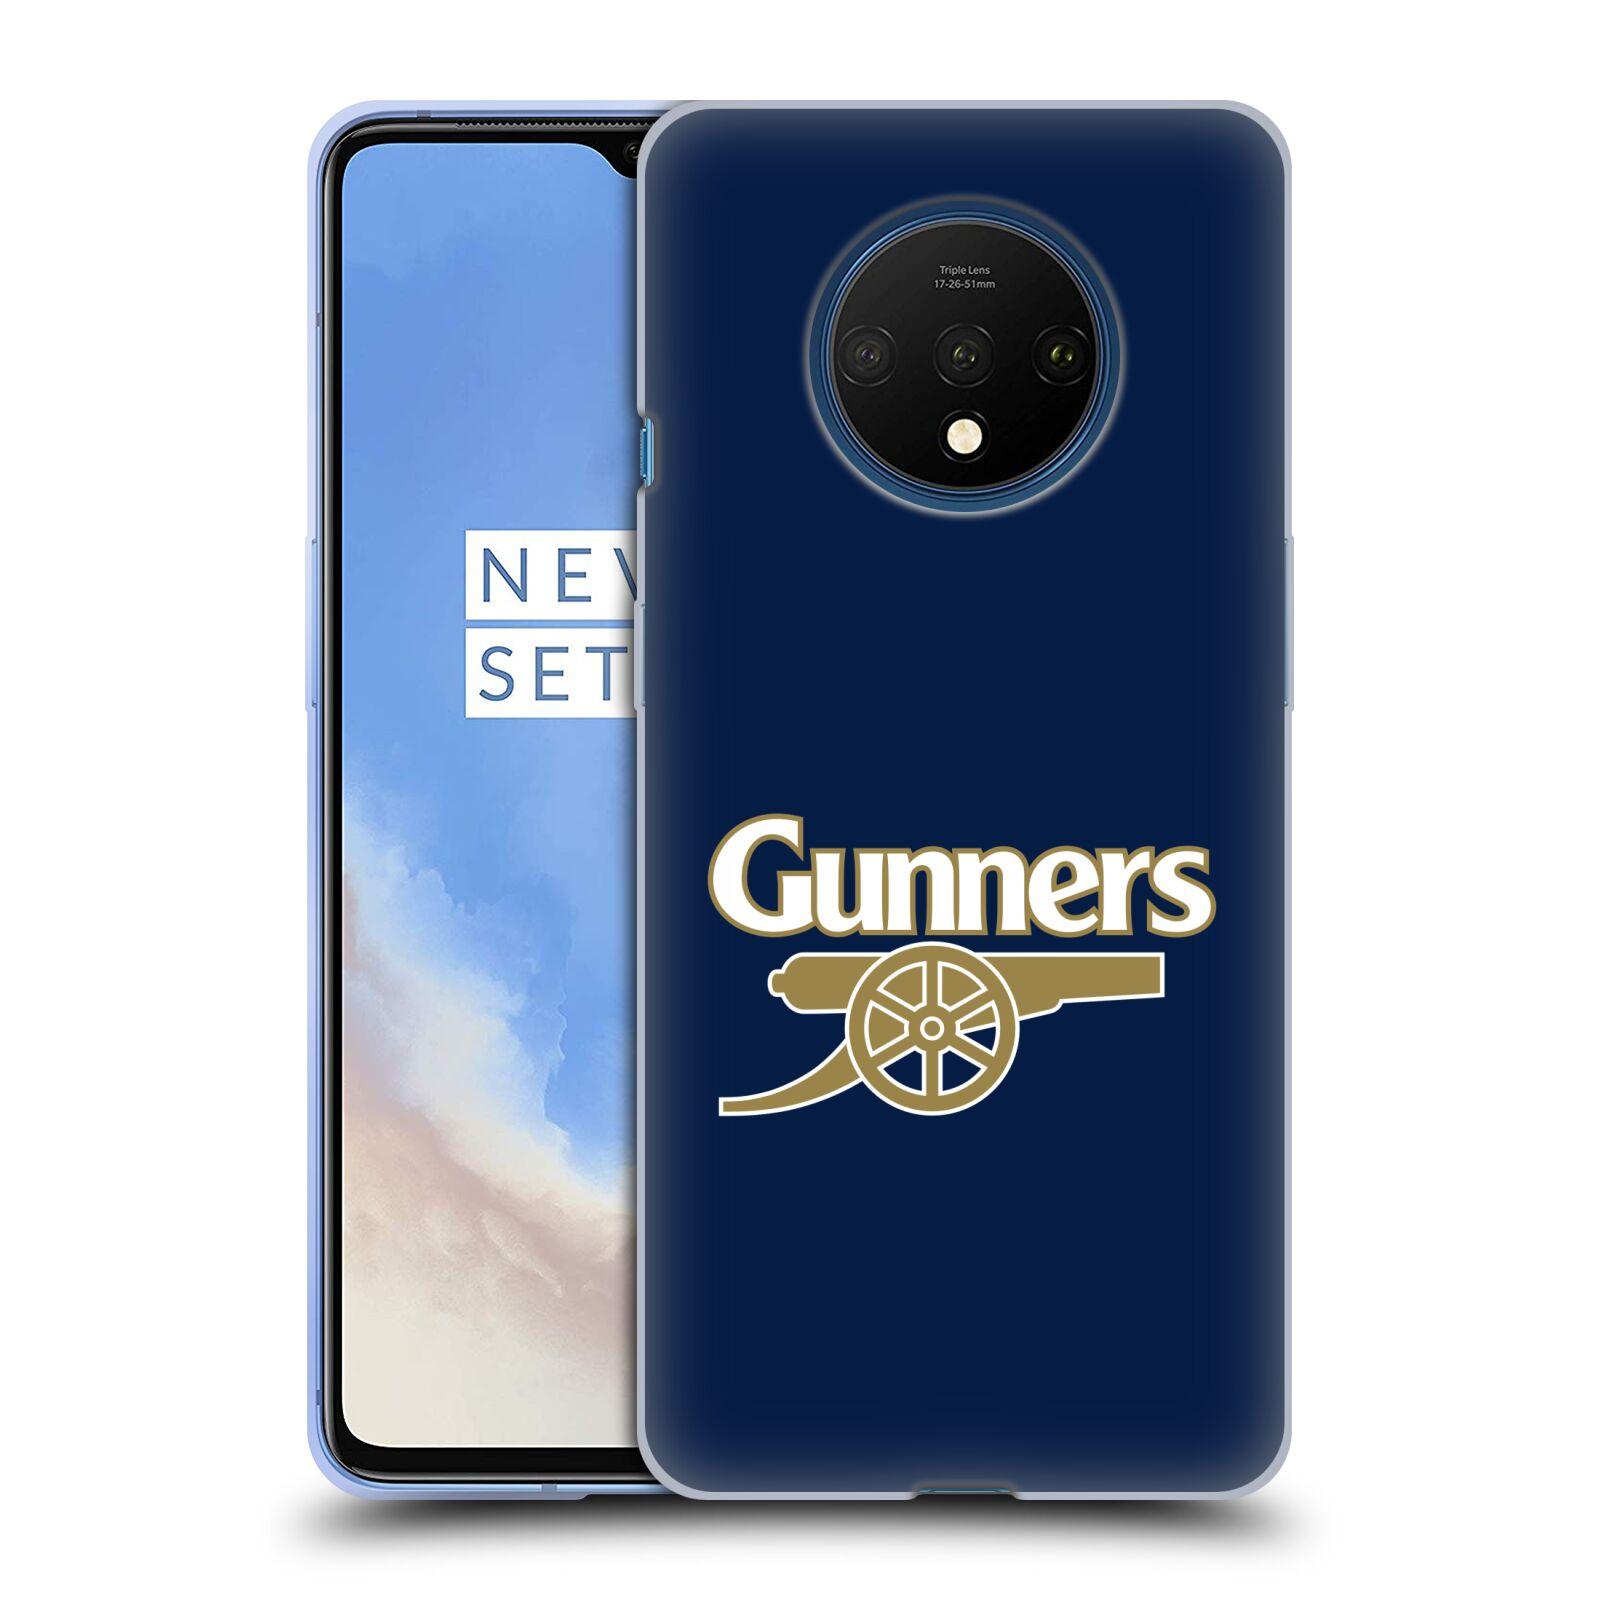 Silikonové pouzdro na mobil OnePlus 7T - Head Case - Arsenal FC - Gunners